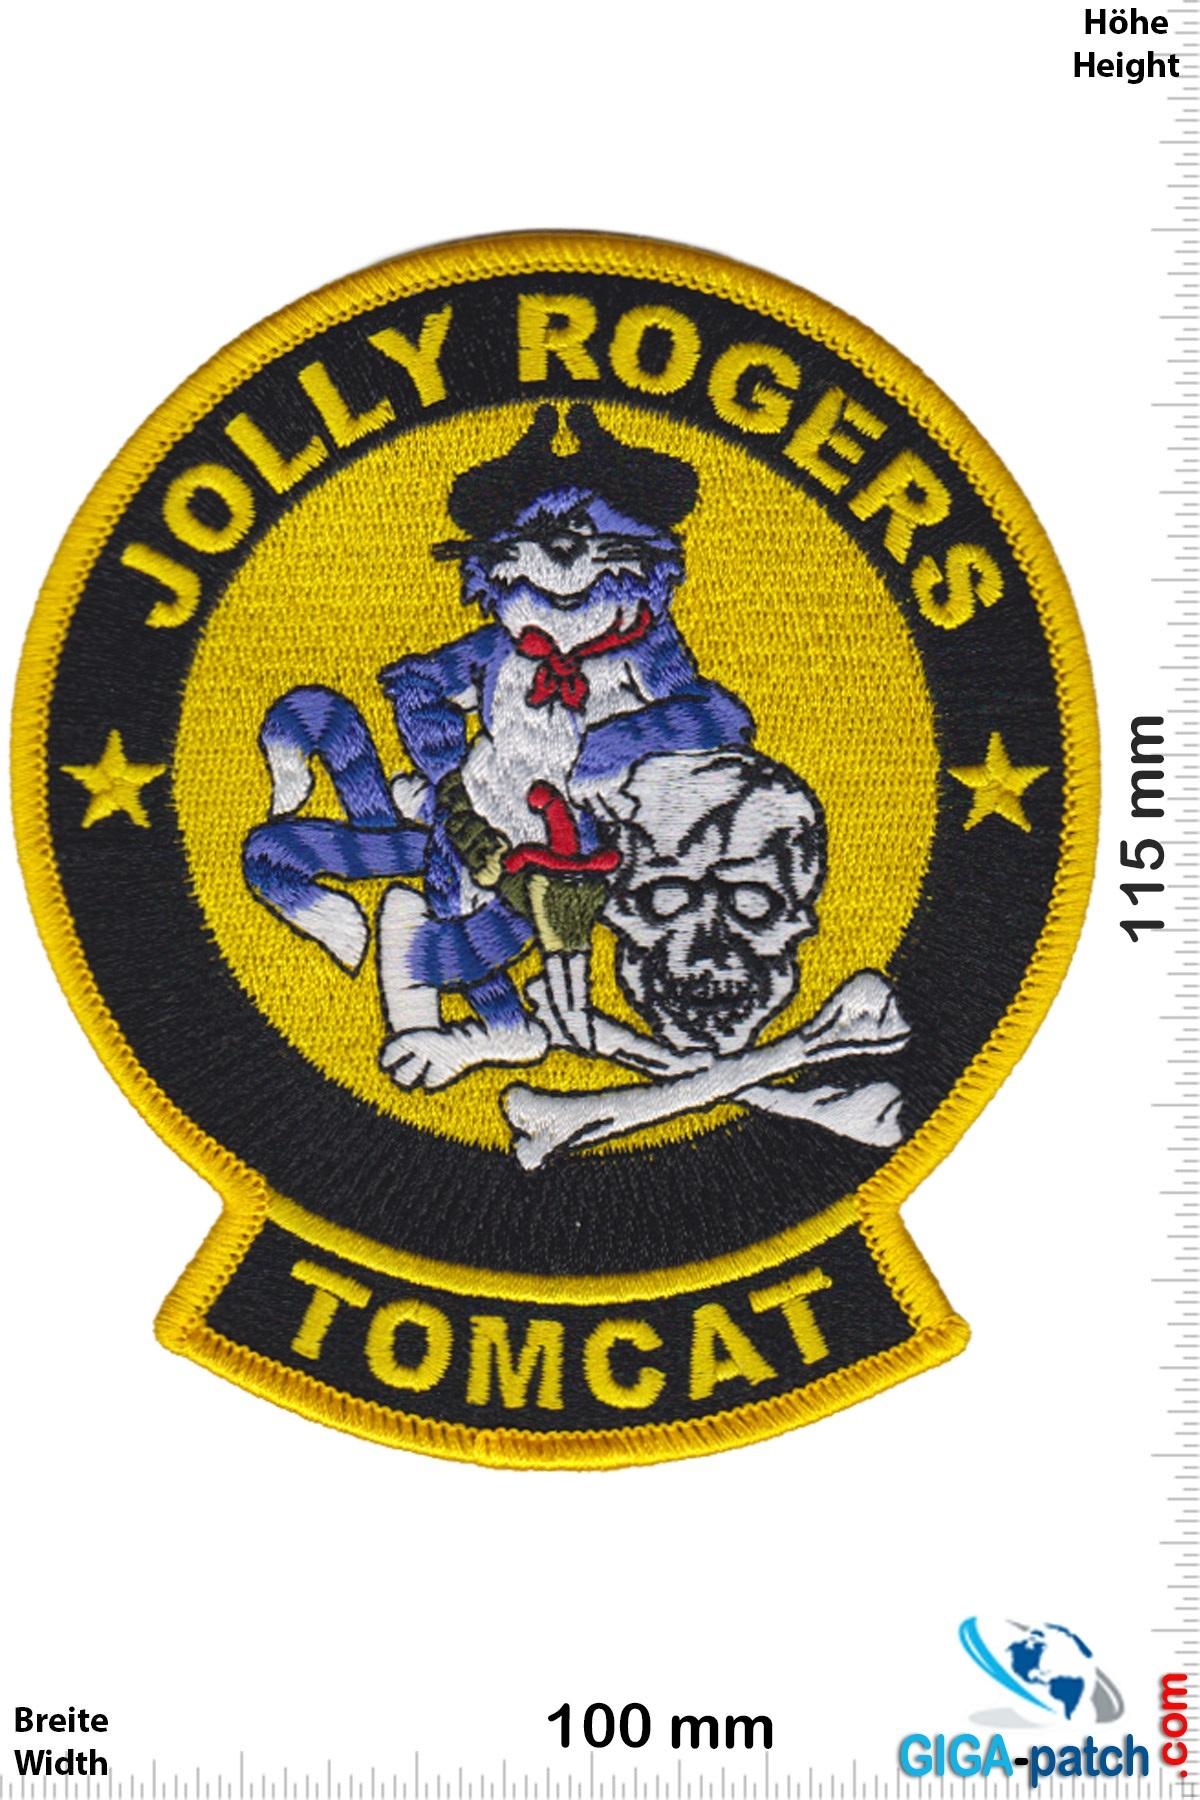 U.S. Navy Strike Fighter Squadron 103 - VFA - 103 Jolly Rogers - Tomcat - HQ